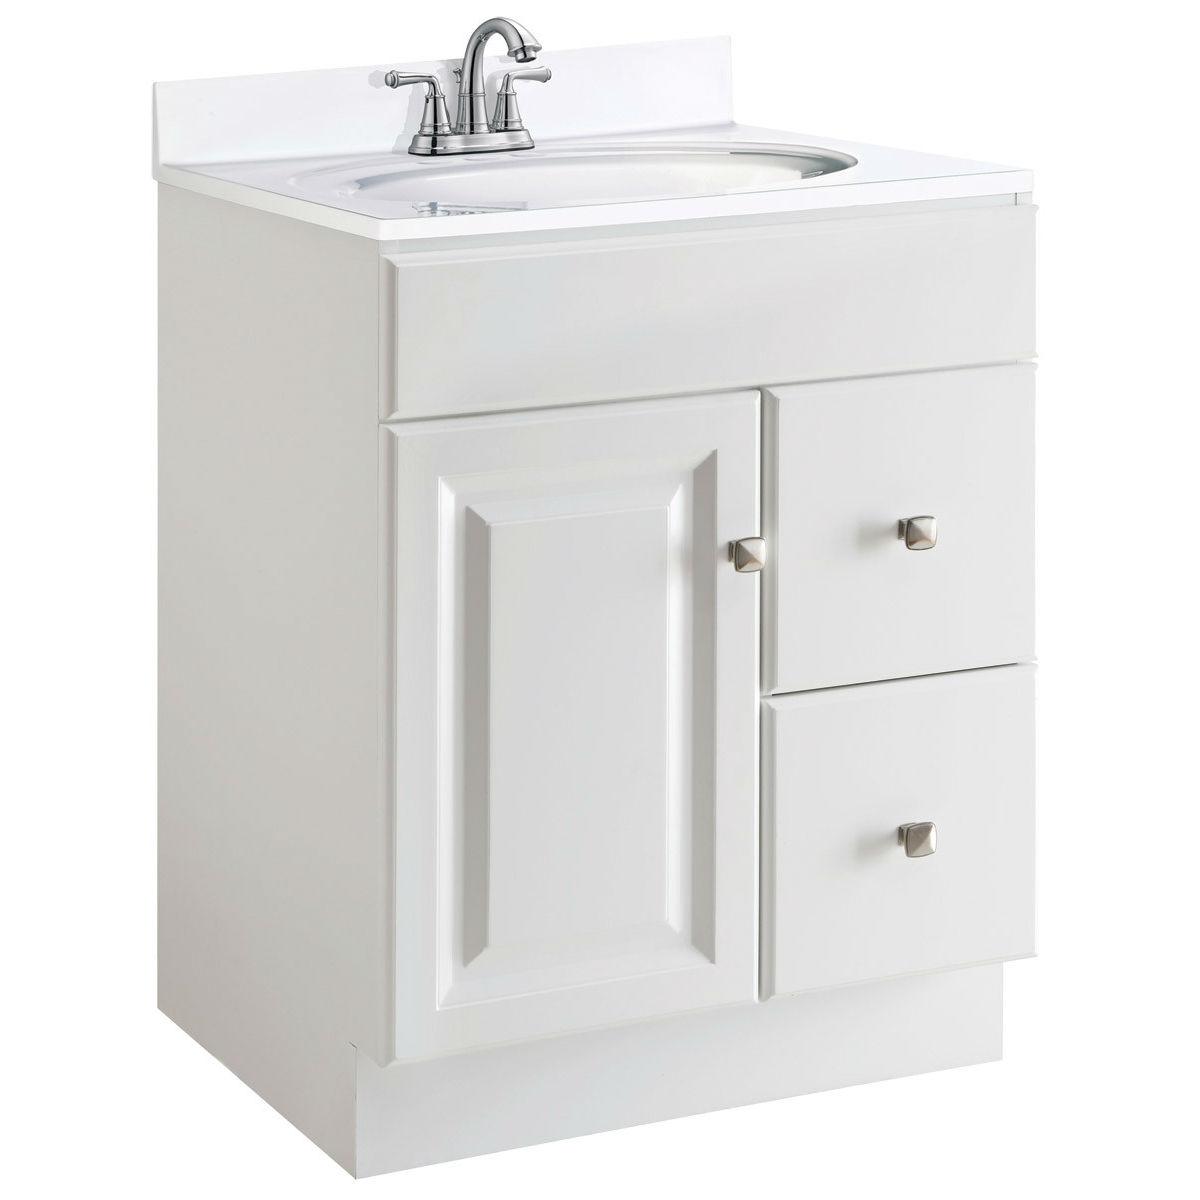 24 inch modern bathroom vanity cabinet base in white semi gloss